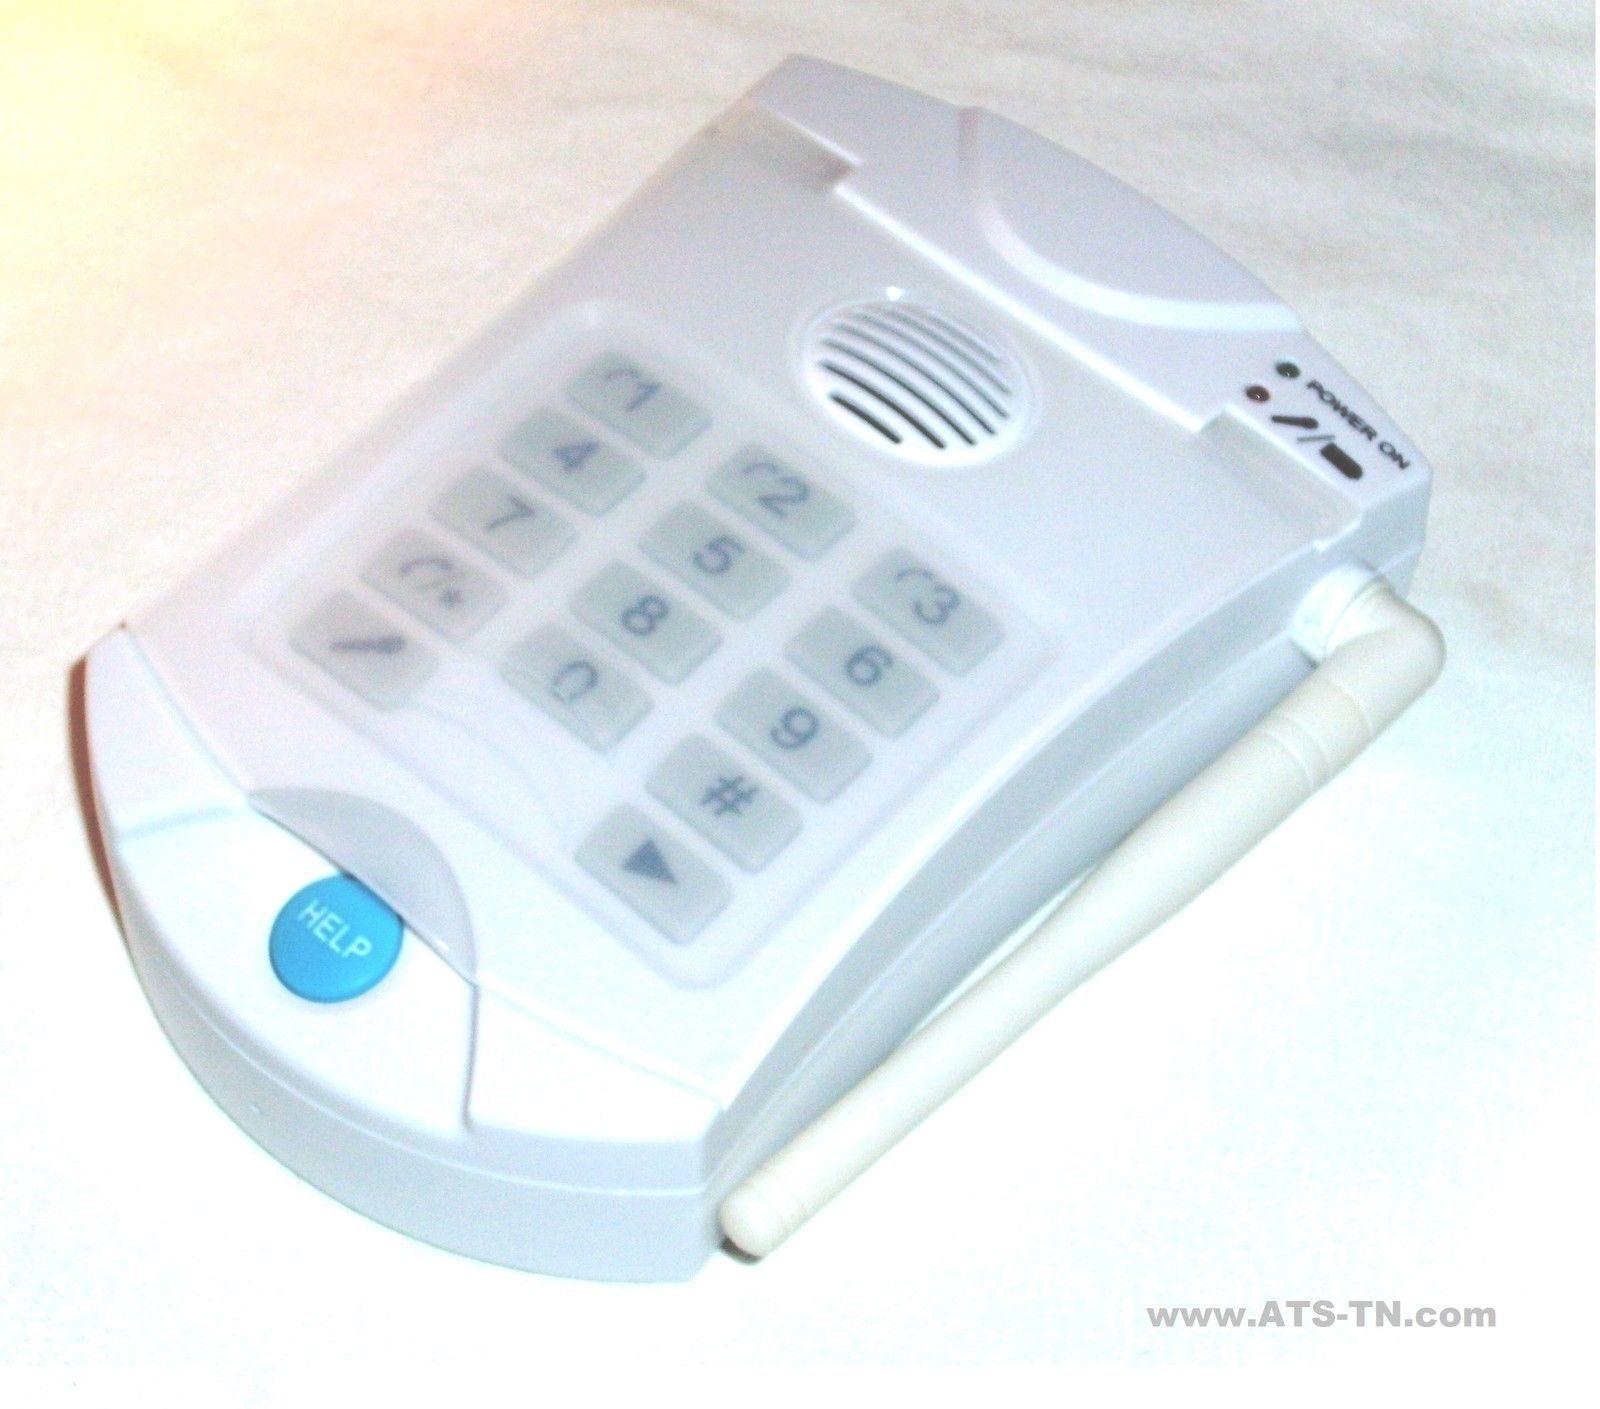 NO MONTHY BILLS - LIFE GUARDIAN SENIOR MEDICAL ALERT 911 ALERT PHONE SYSTEM